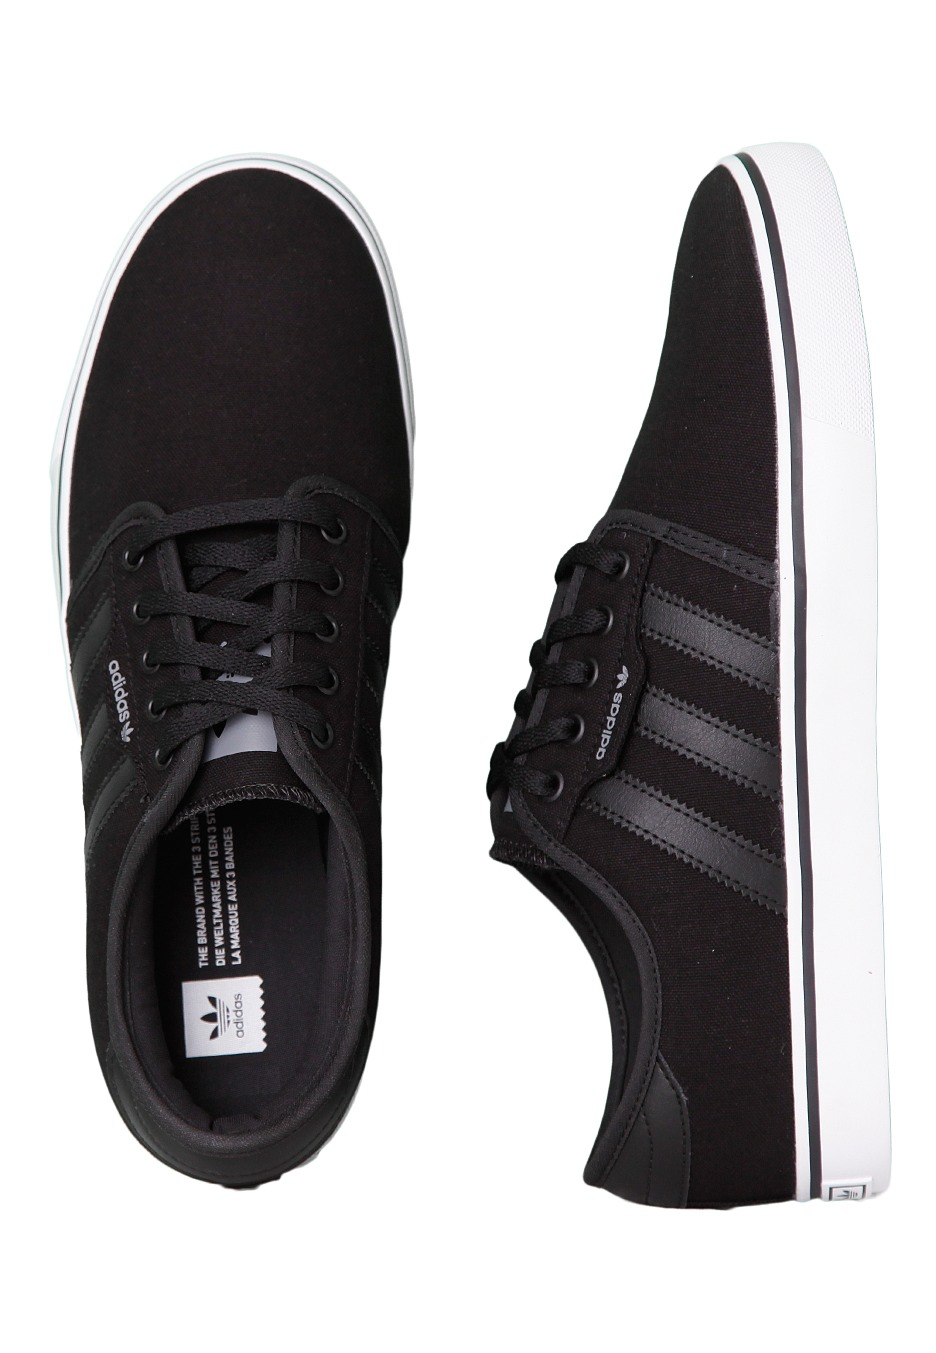 d01fa987b78 Adidas - Seeley Core Black Grey Ftwr White - Shoes - Impericon.com Worldwide